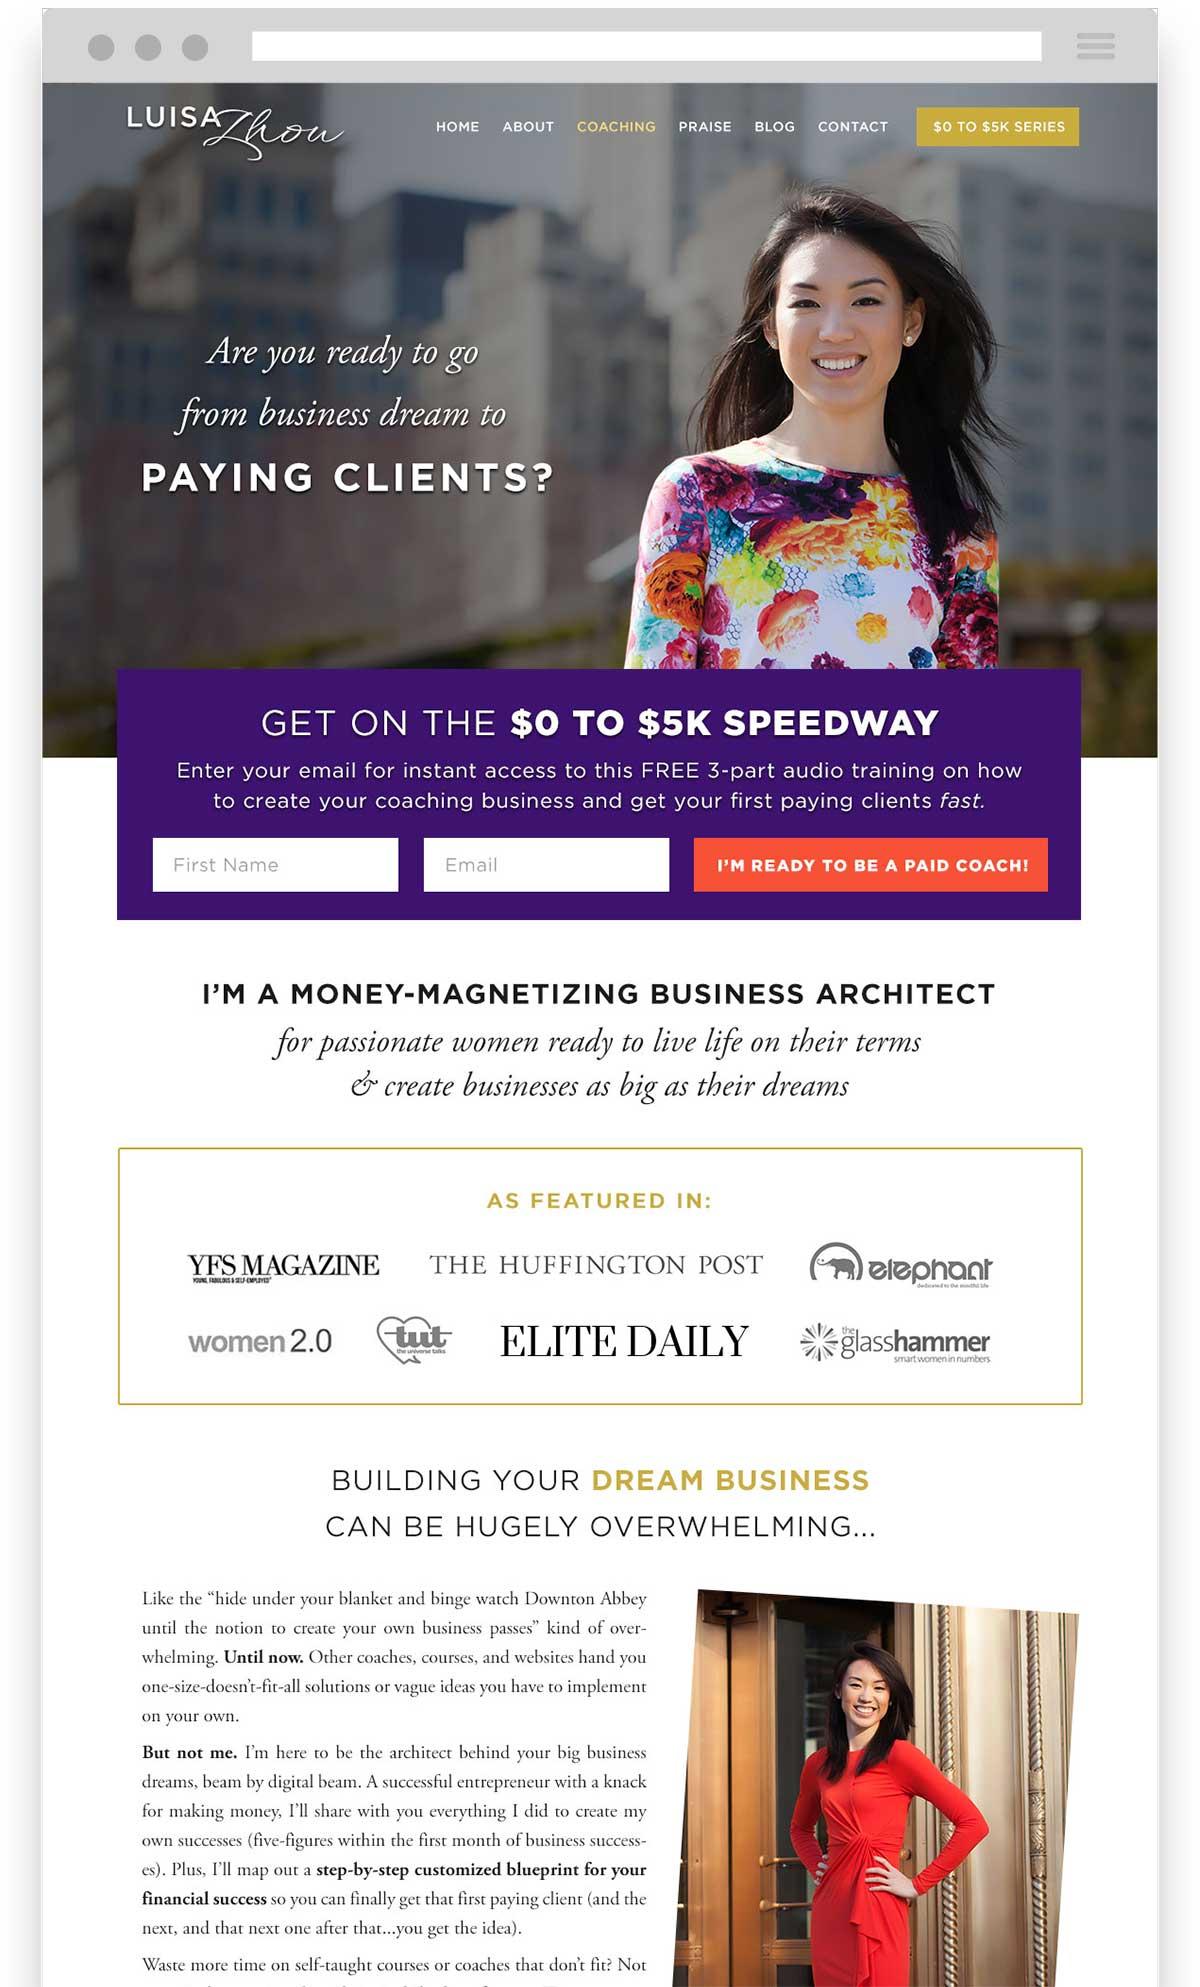 Luisa Zhou website design